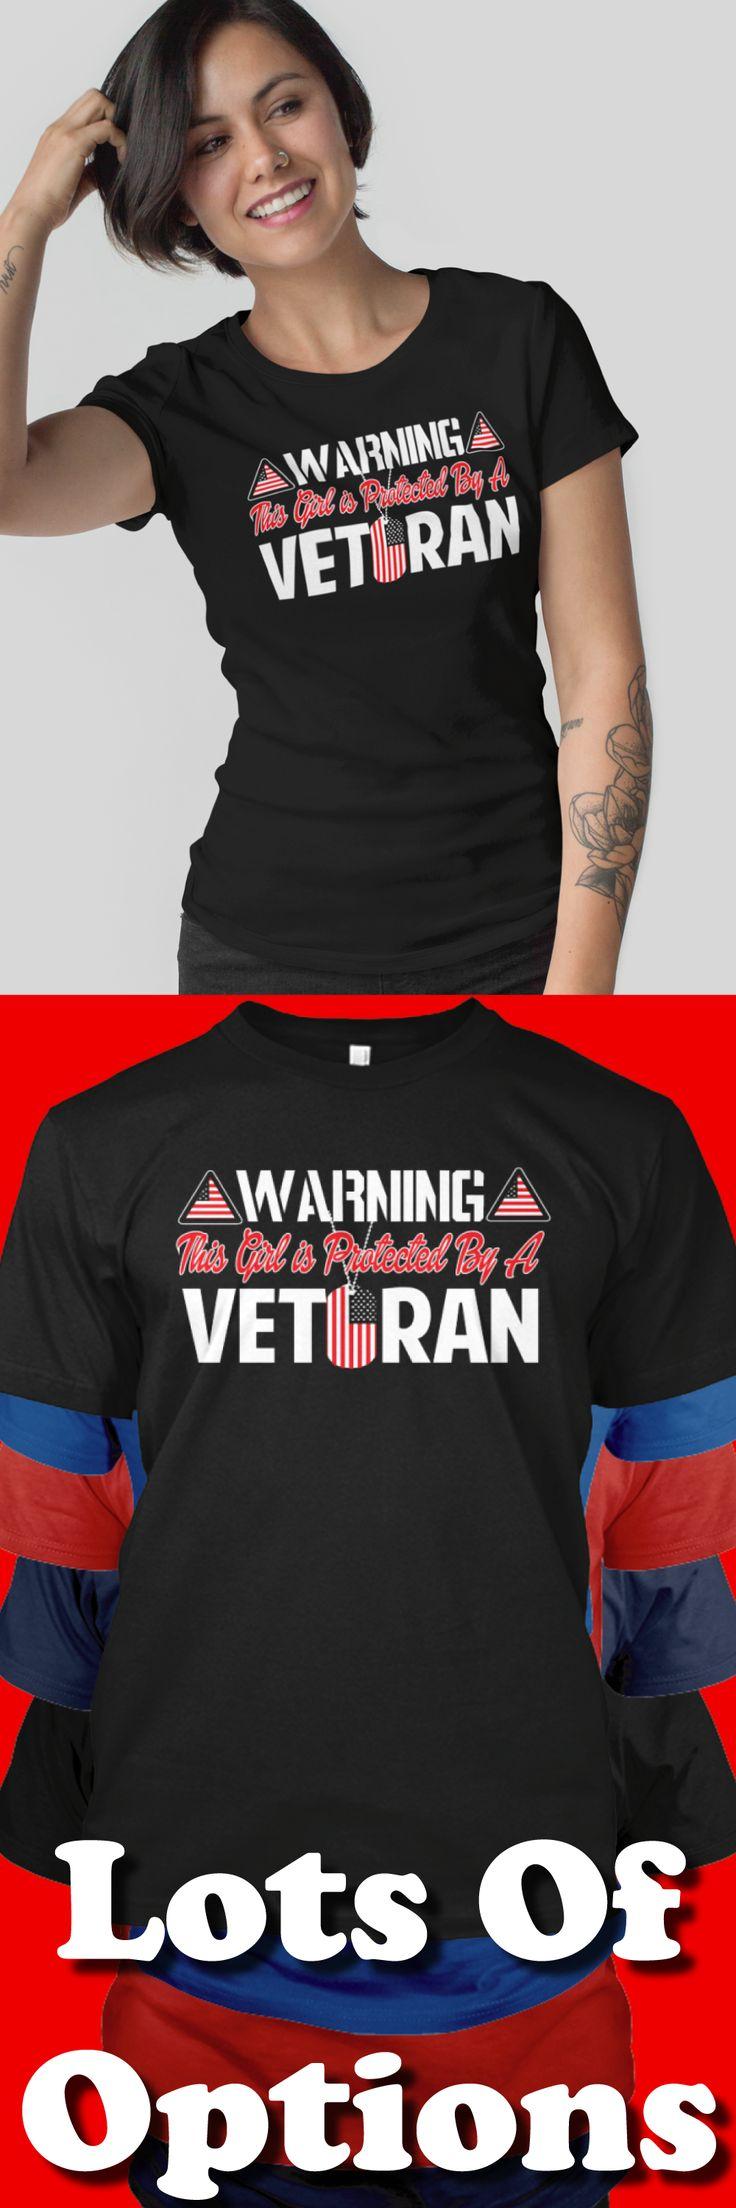 Veteran Shirts: You Love Veterans? Love Veteran Shirts? Great Veteran Army Gift! Lots Of Sizes & Colors. Like Veteran Life, American Veterans, Veteran Shirts home, Funny t-shirts and hoodies for Veteran lovers and Veteran shirts American flag? Strict Limit Of 5 Shirts! Treat Yourself & Click Now! https://teespring.com/PC45-431